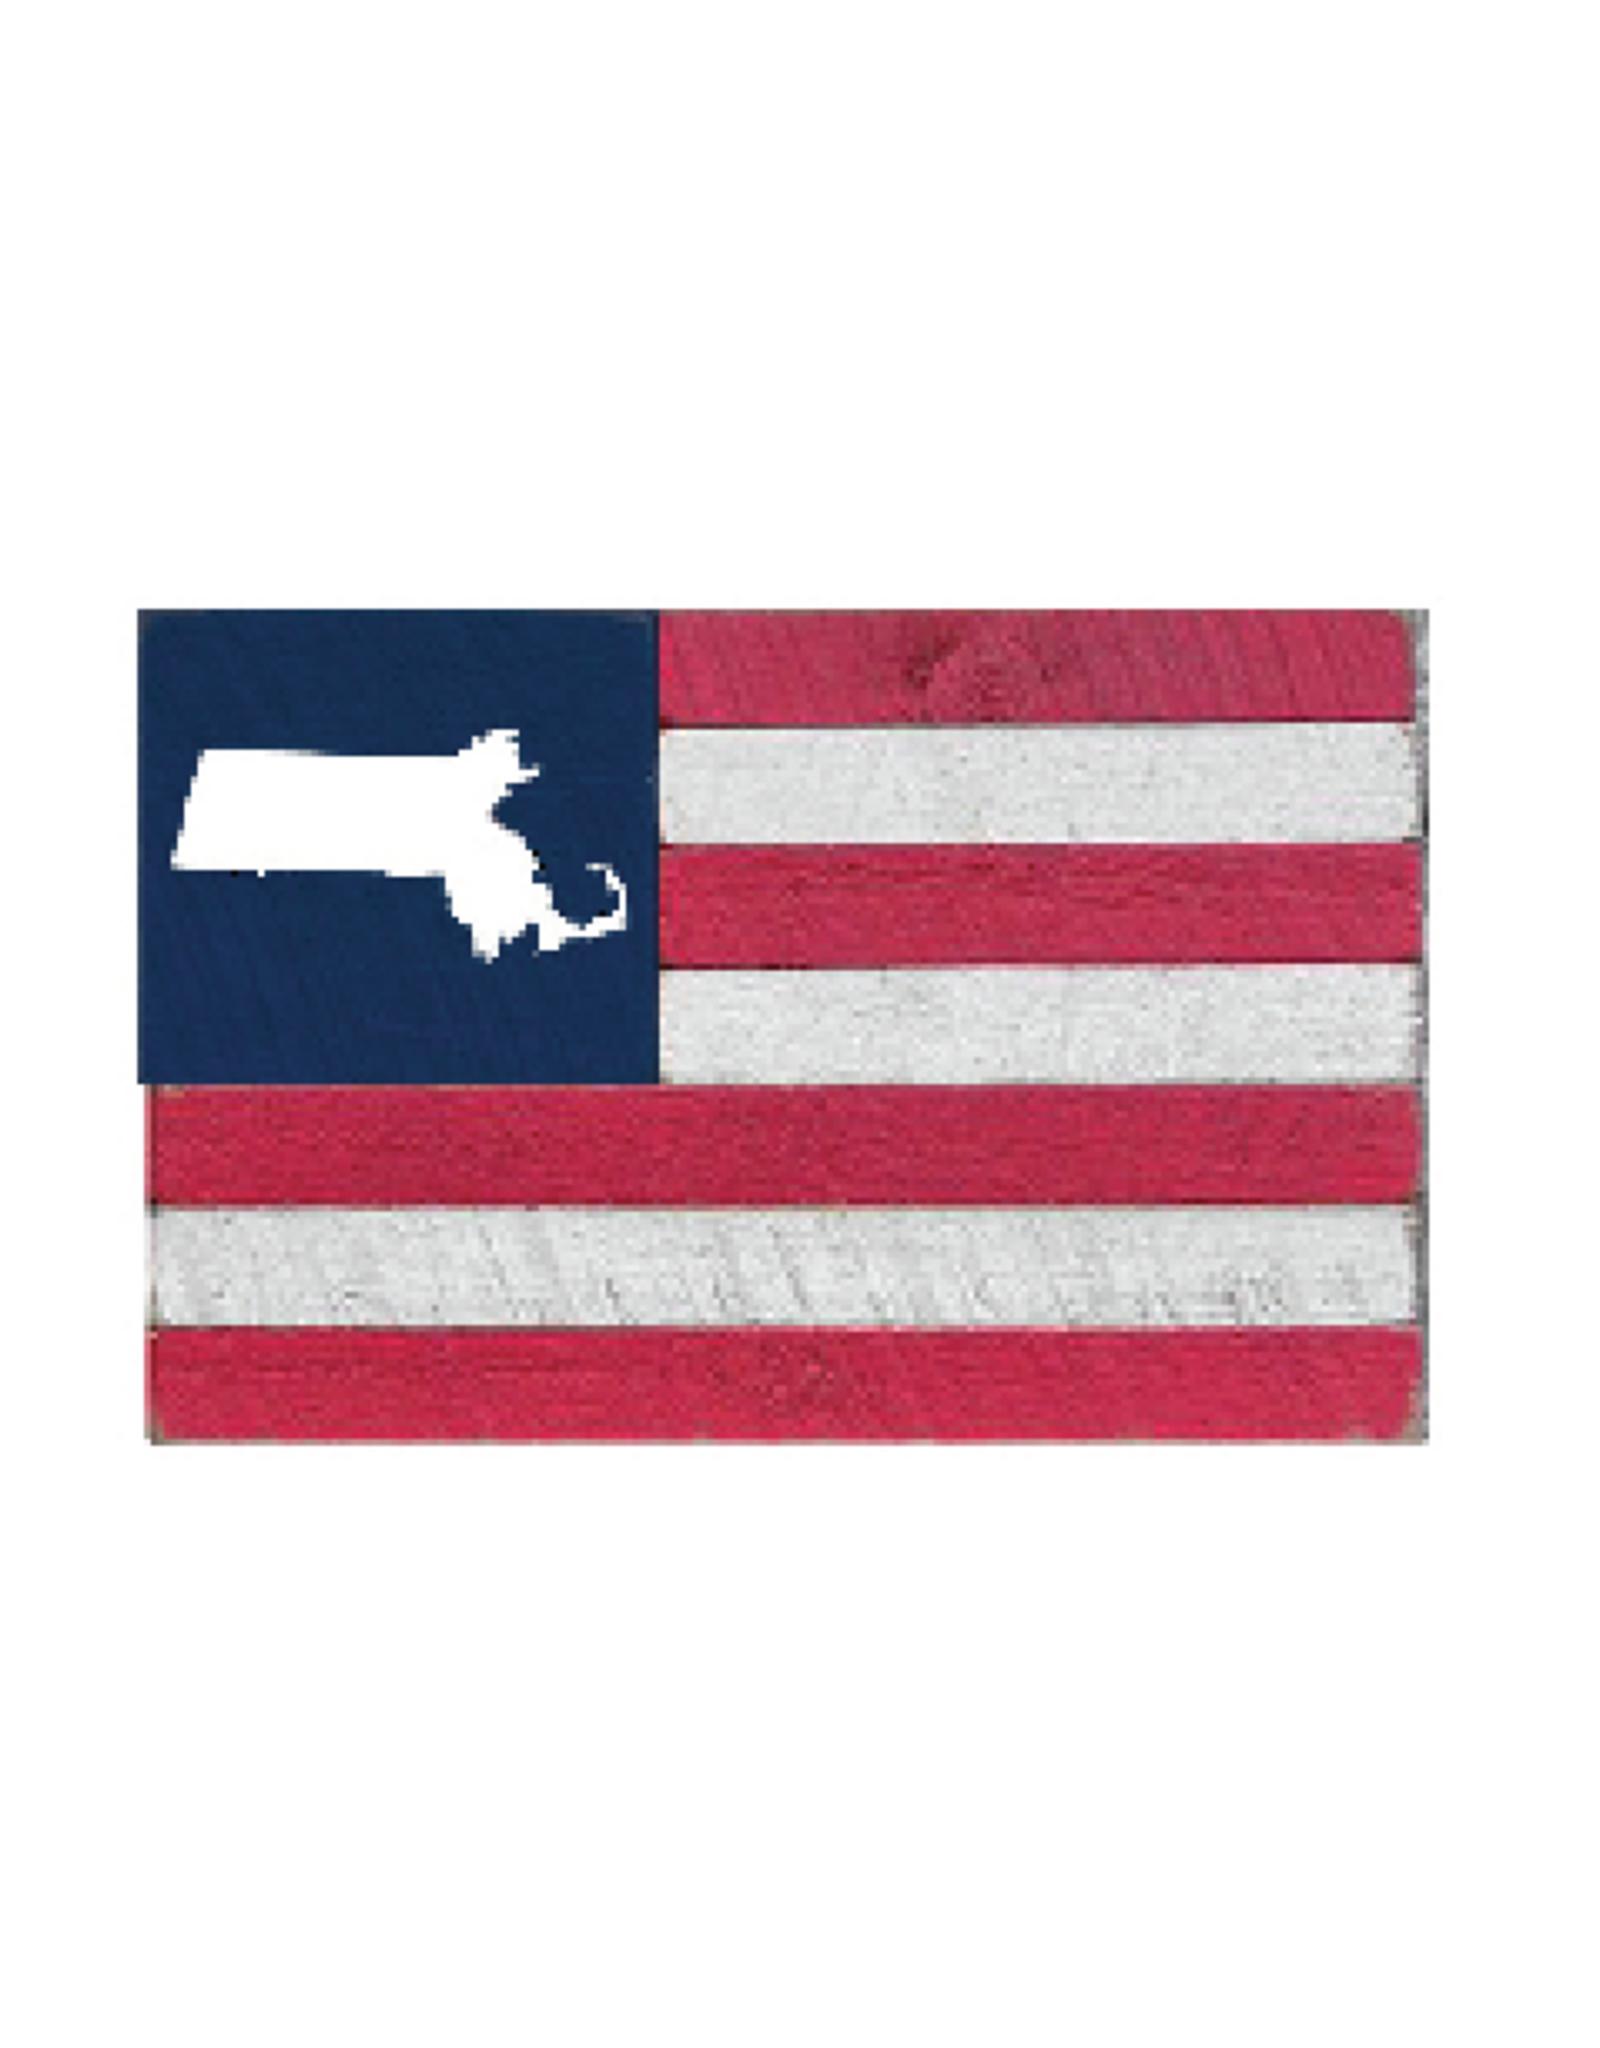 Rustic Marlin Rustic Marlin - XL Blocks Flag - MA